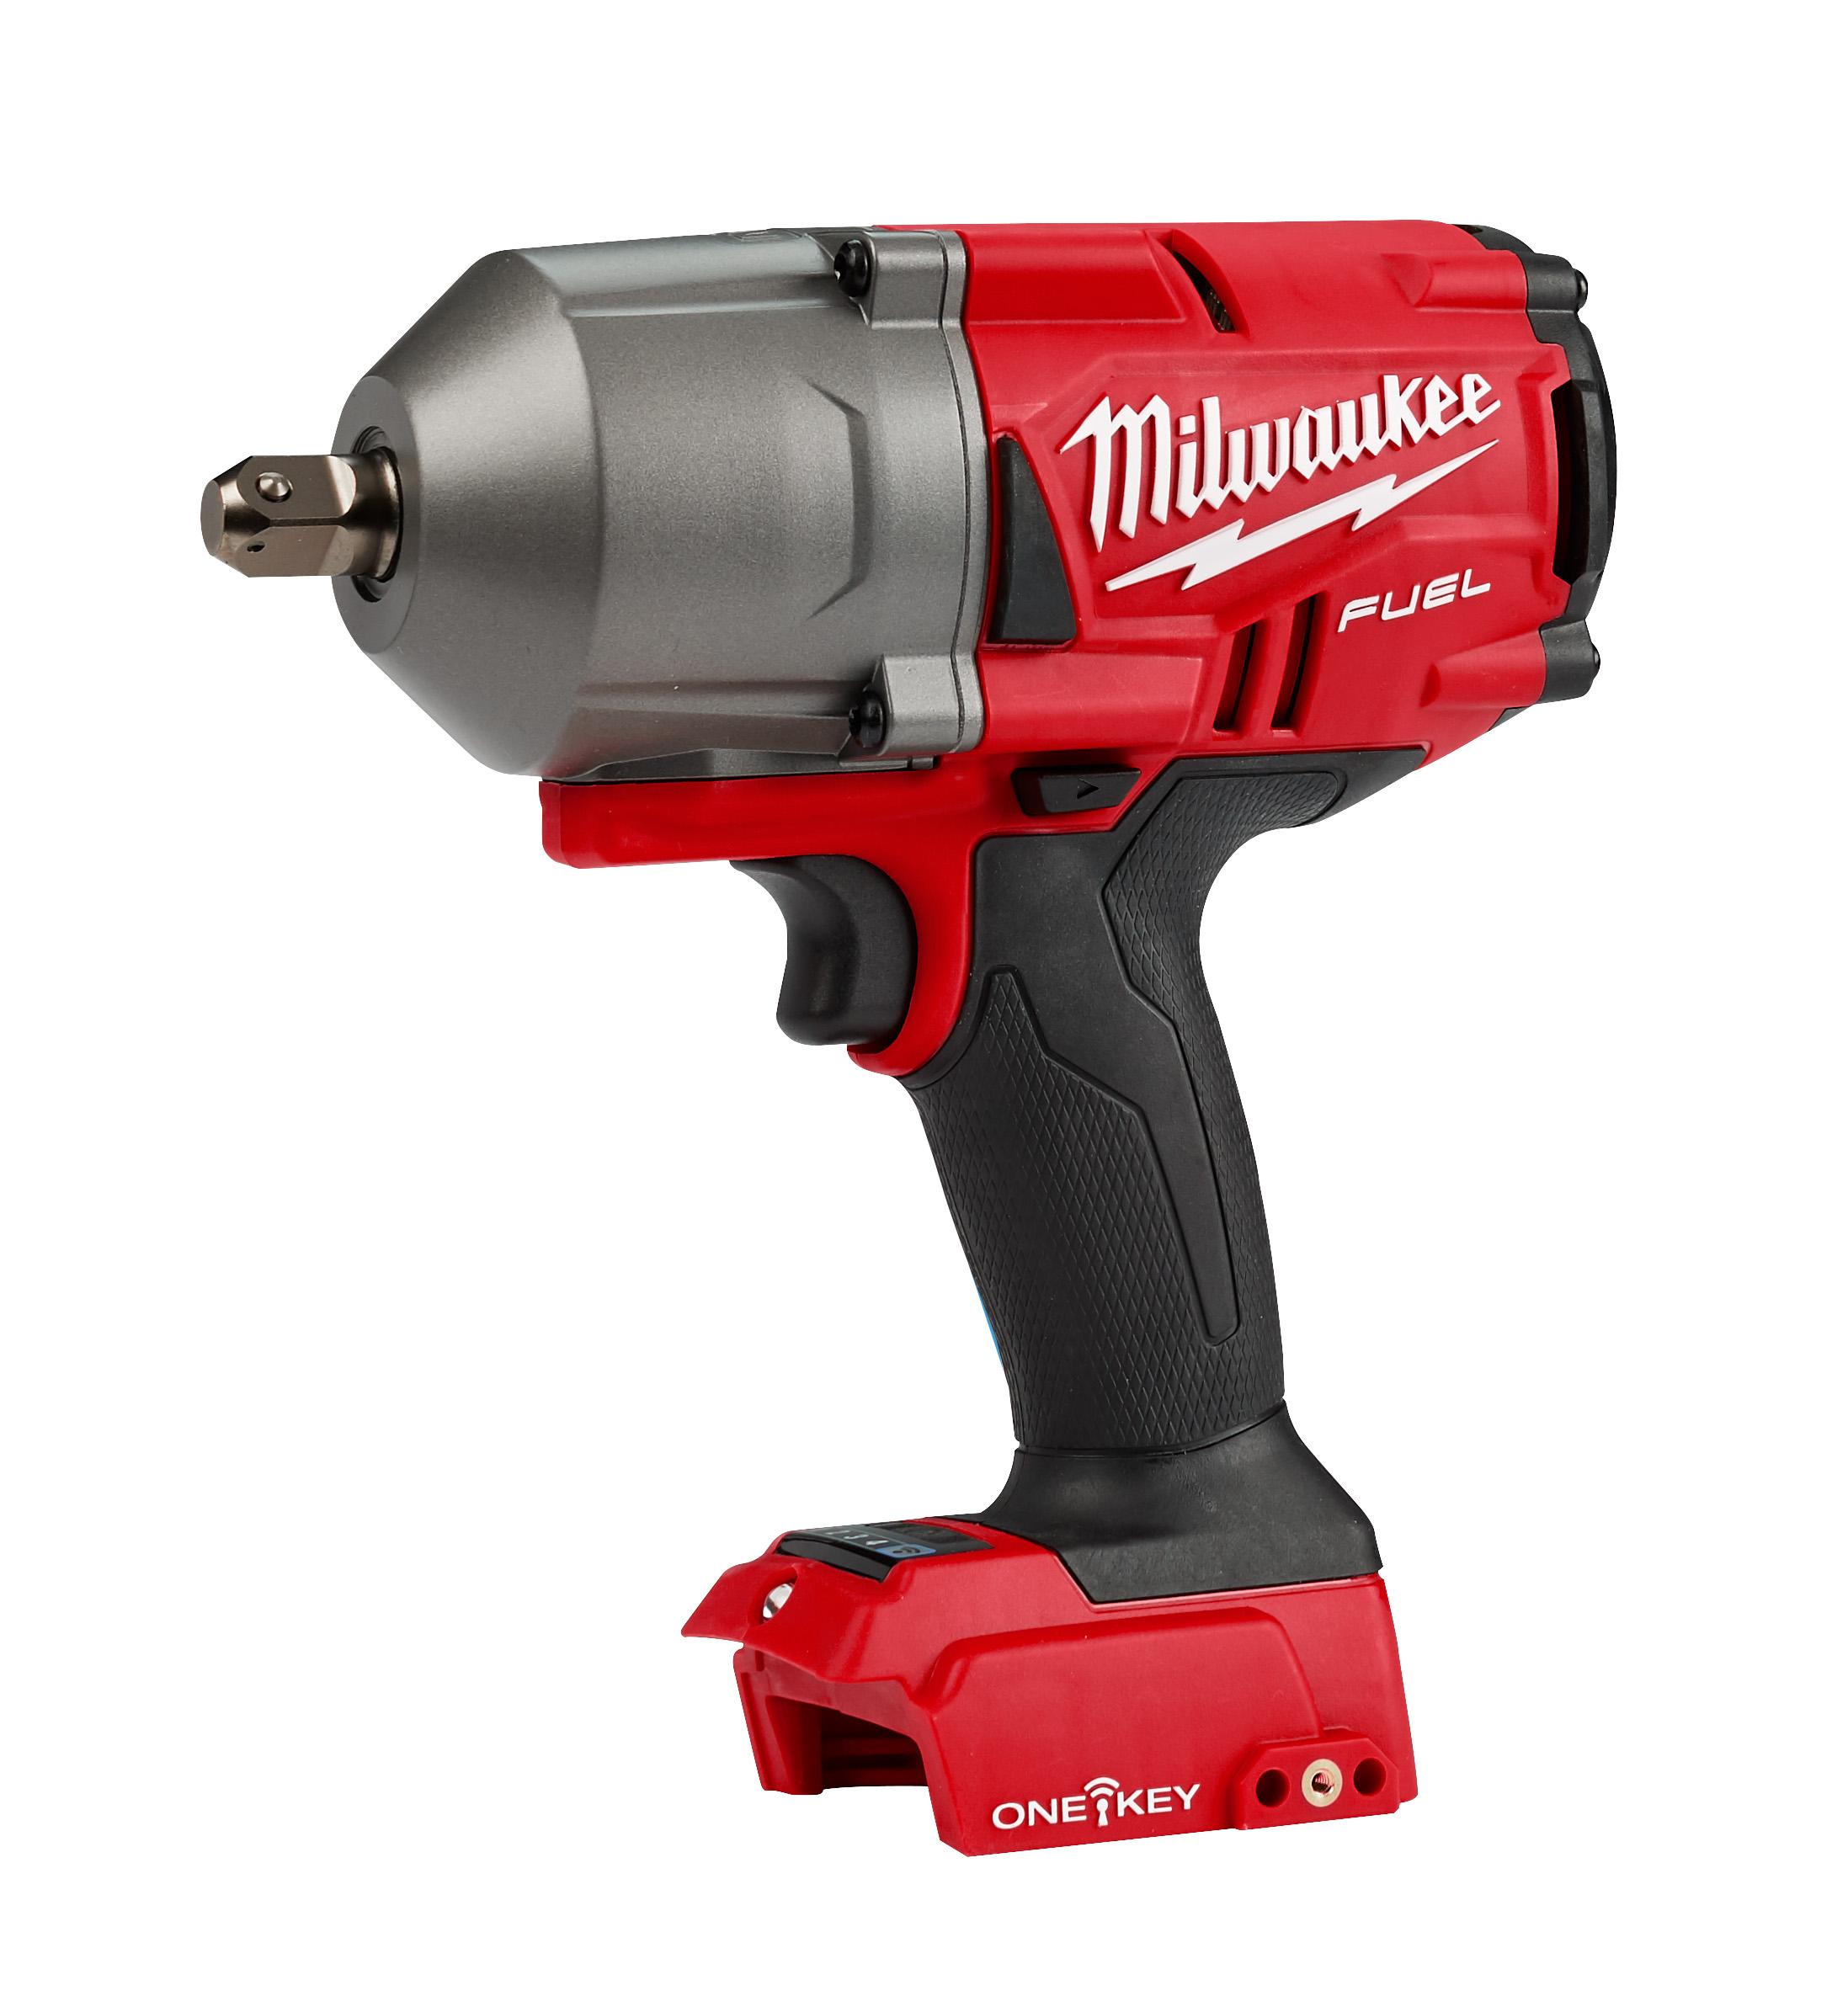 "Milwaukee 2862-20 M18 FUEL 1/2"" High-Torque Impact Wrench w/ ONE-KEY"